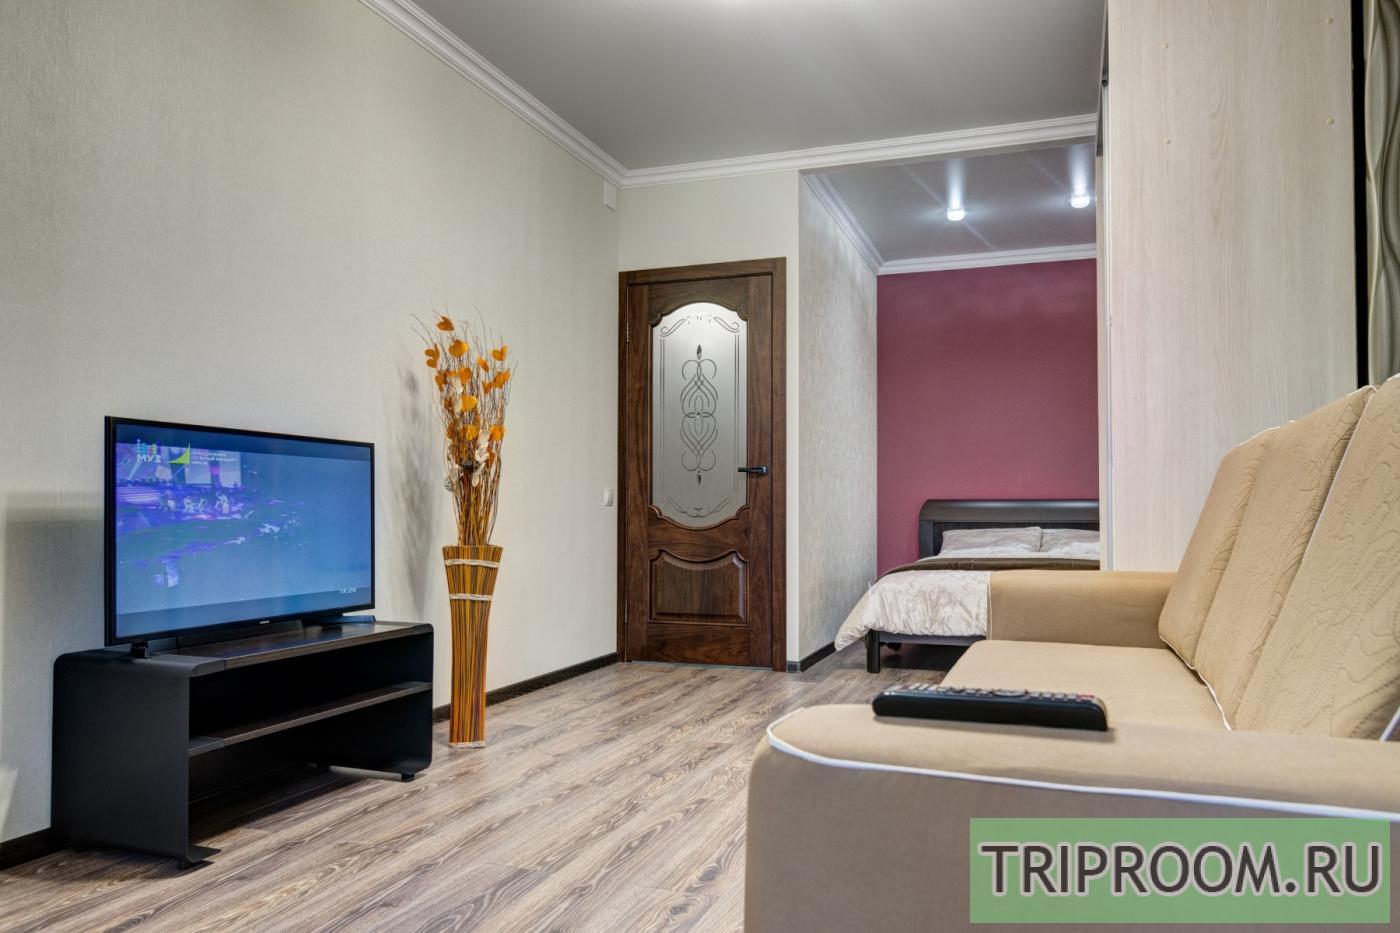 1-комнатная квартира посуточно (вариант № 28442), ул. Суворова улица, фото № 2